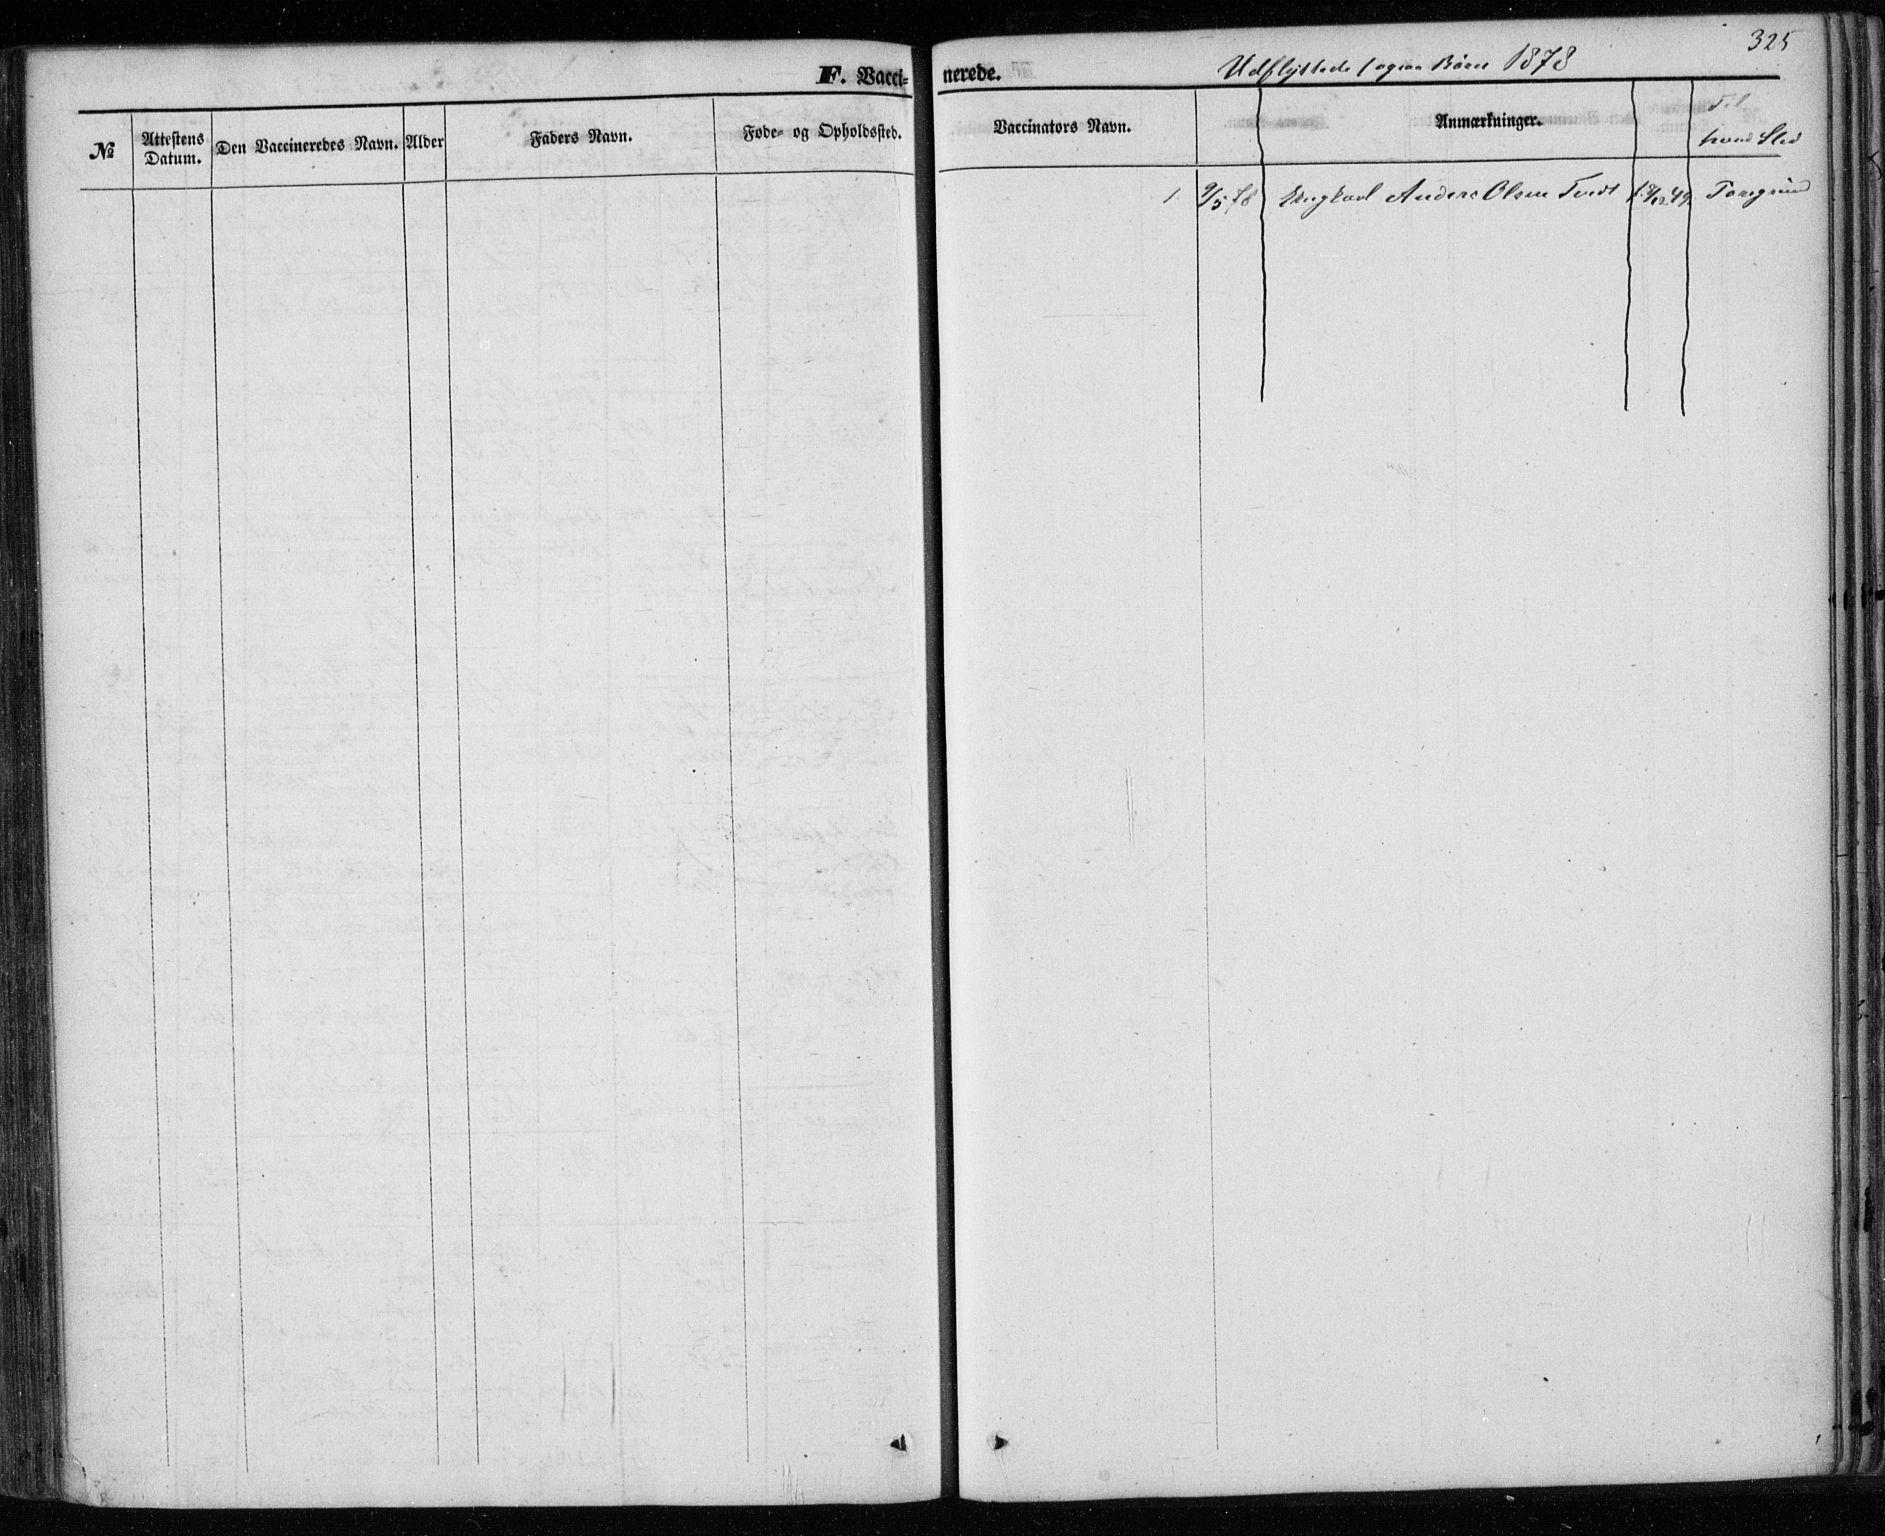 SAKO, Holla kirkebøker, F/Fa/L0006: Ministerialbok nr. 6, 1861-1869, s. 325